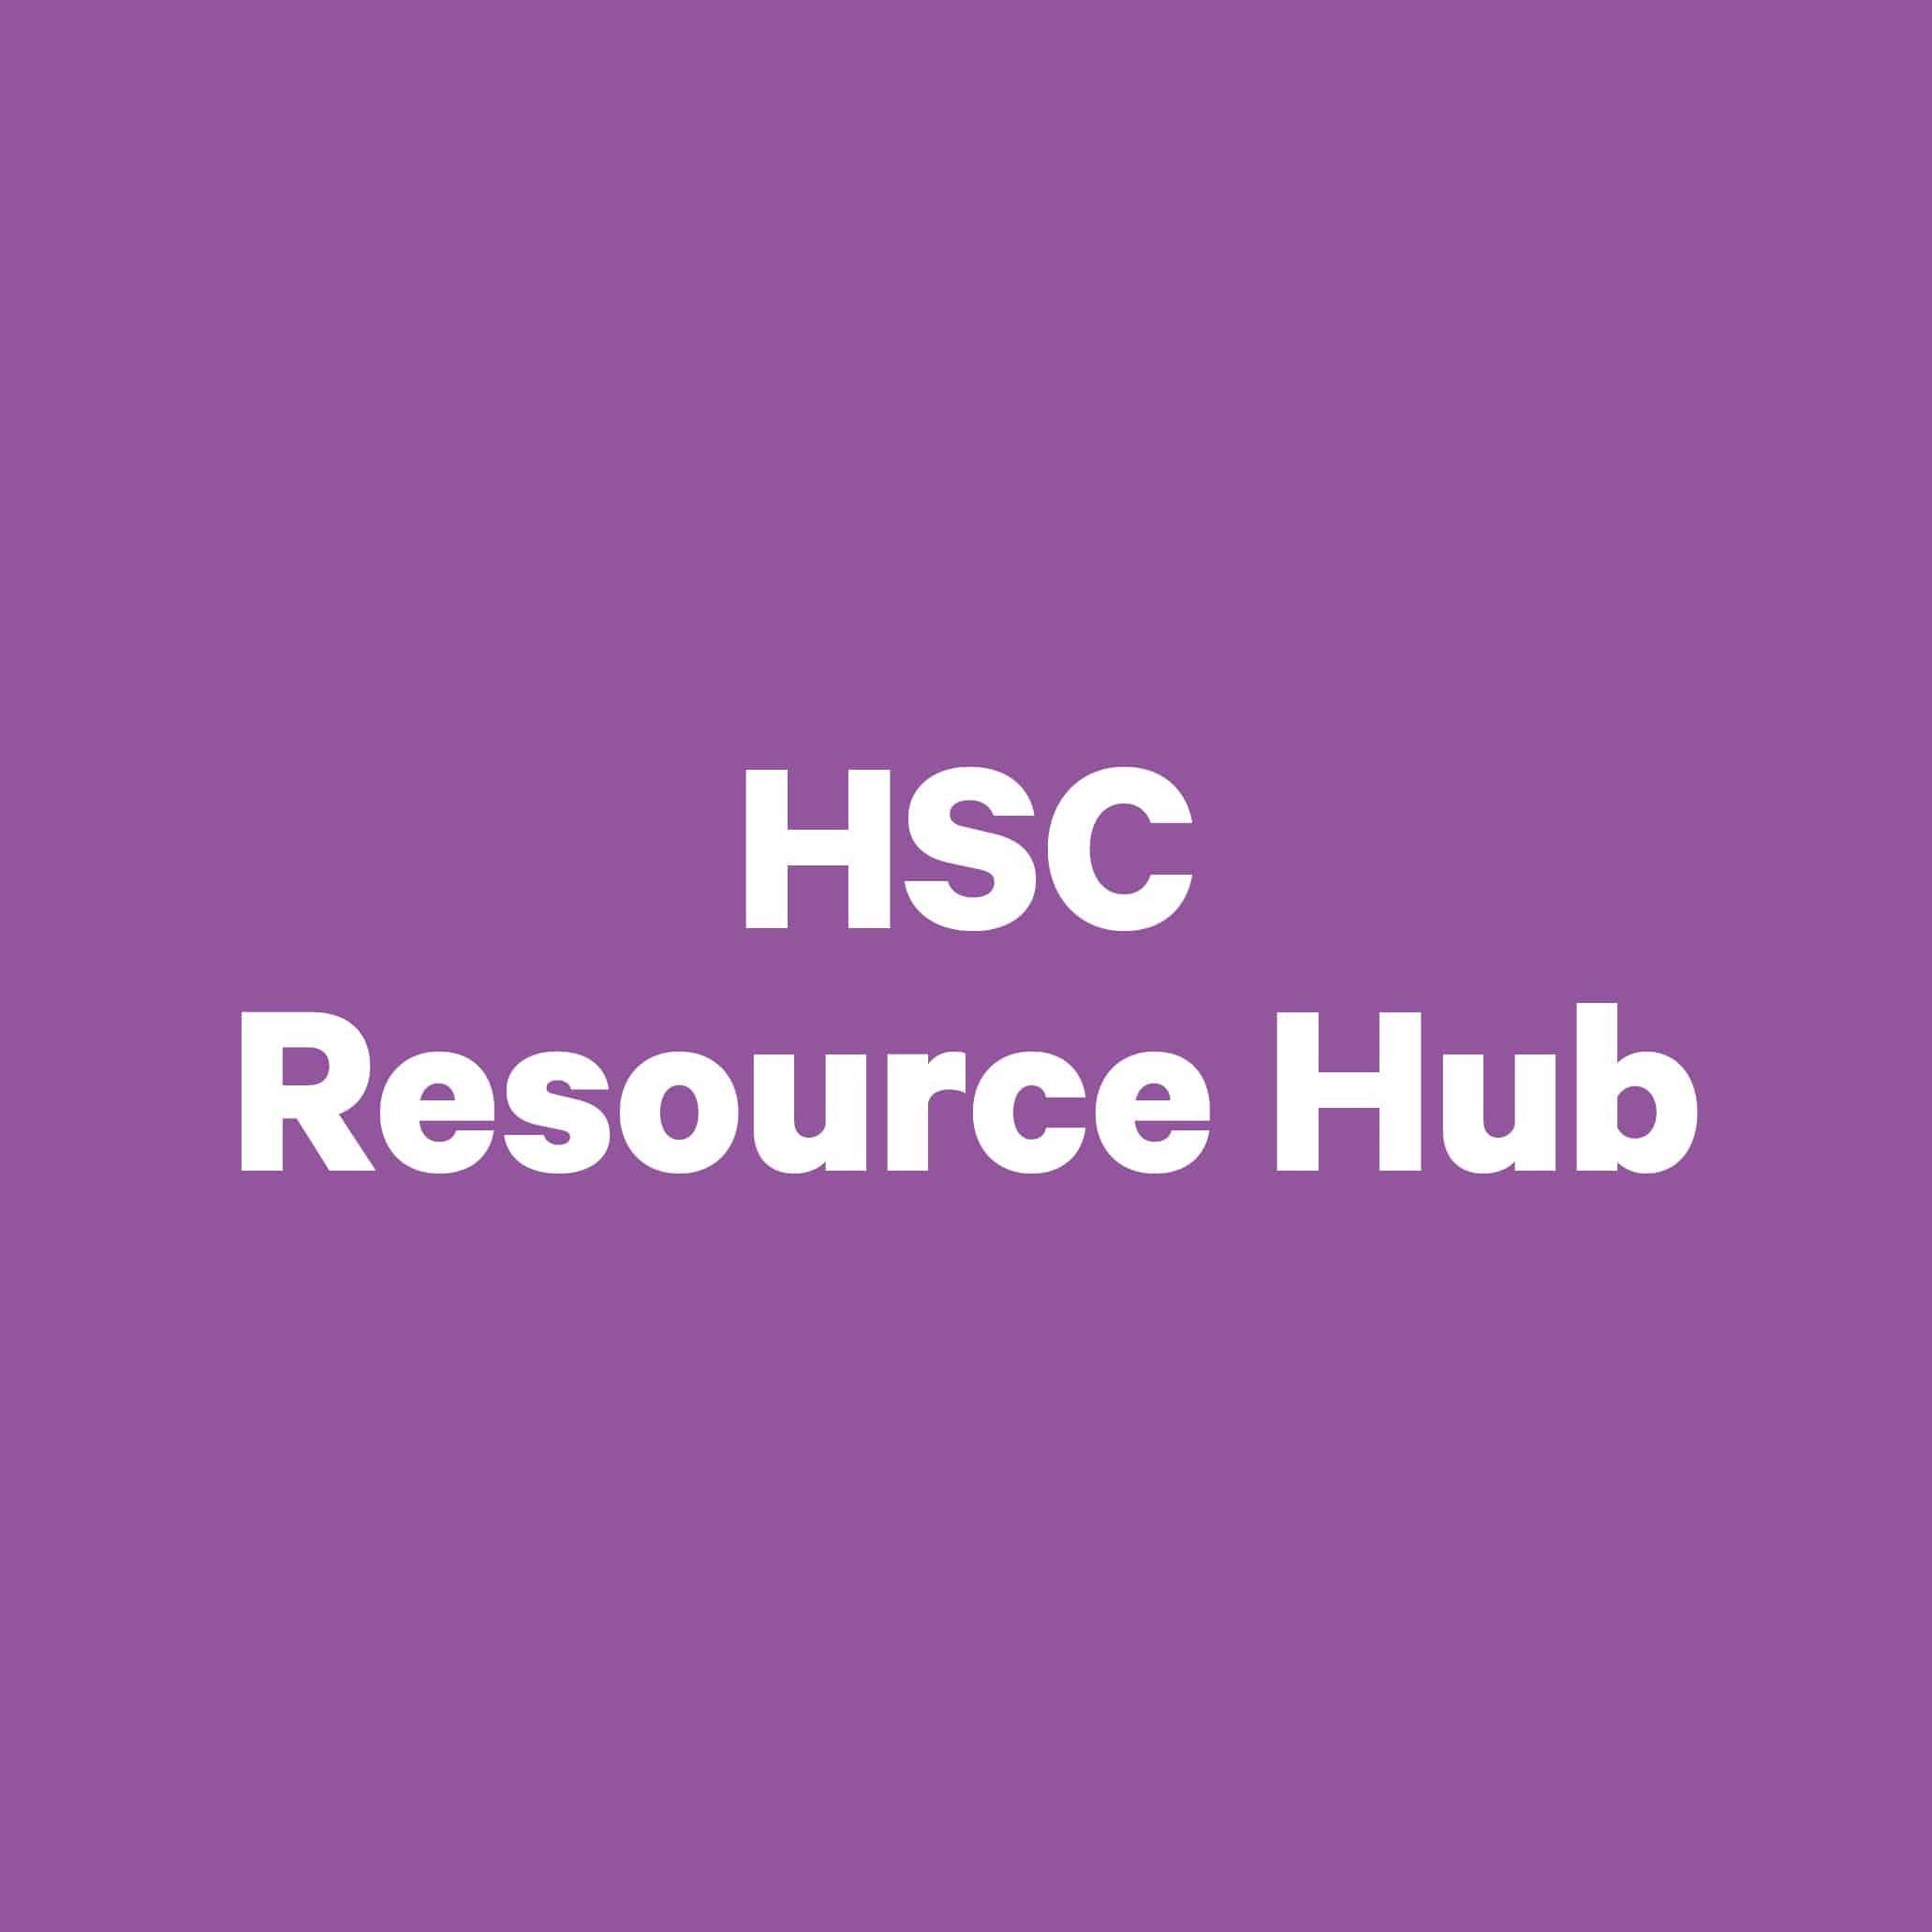 HSC Resource hub